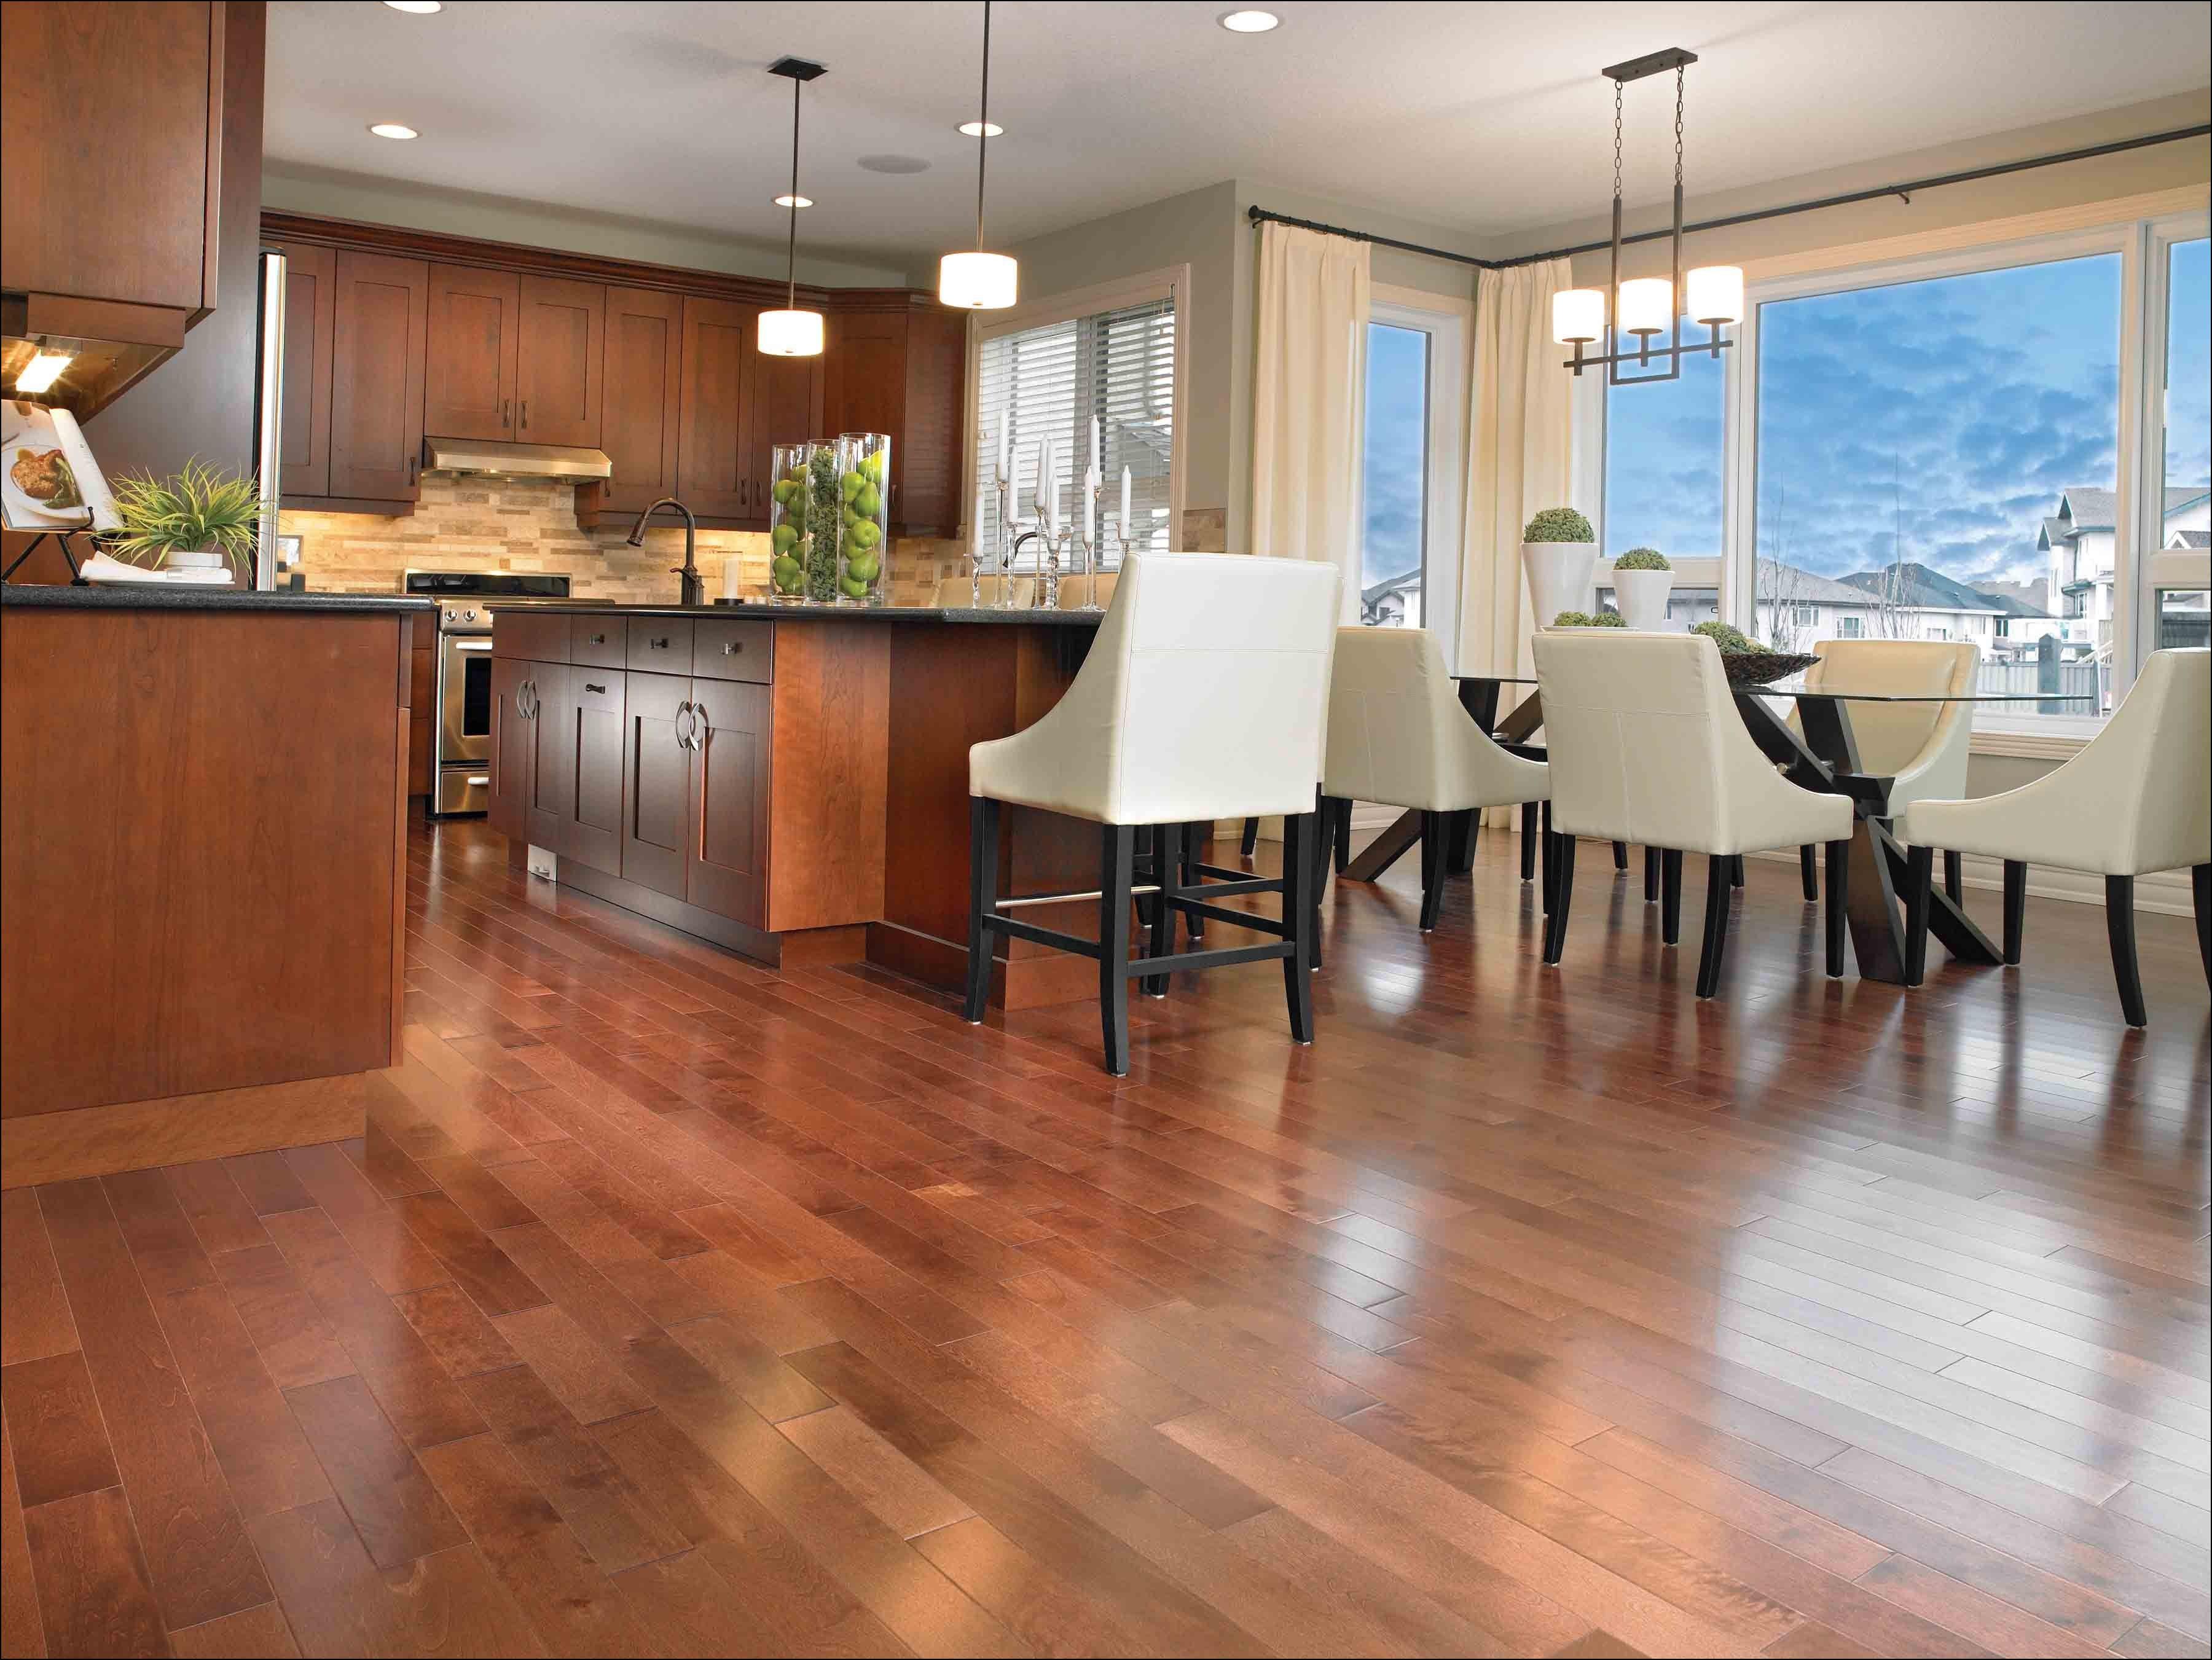 pecan hardwood flooring reviews of hardwood flooring suppliers france flooring ideas regarding hardwood flooring installation san diego images 54 best exotic flooring images on pinterest of hardwood flooring